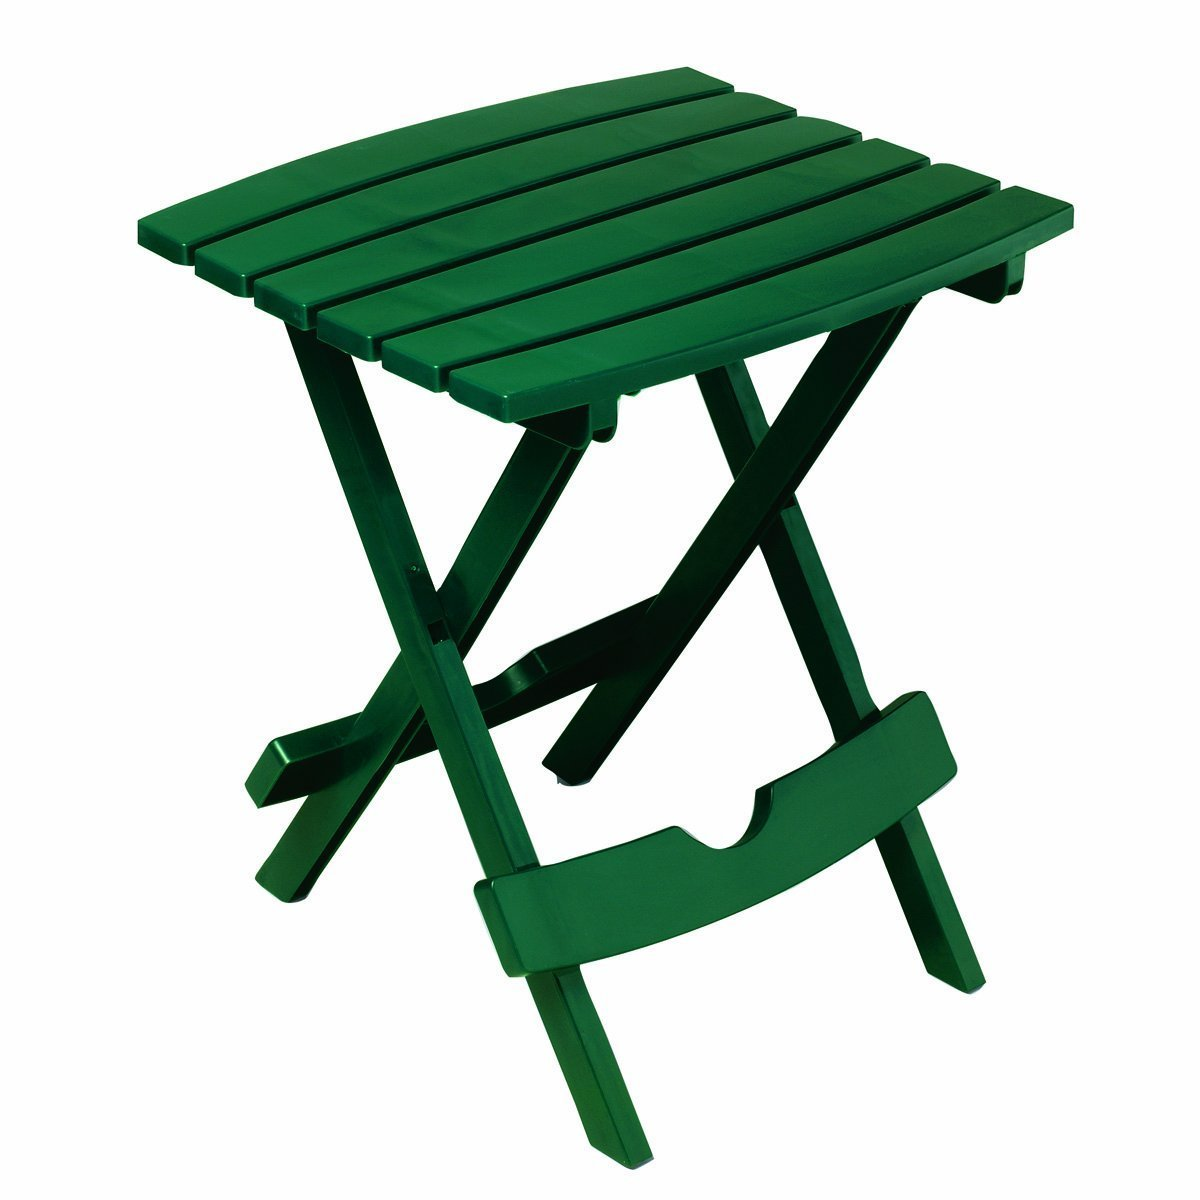 Adams Manufacturing 8500-16-3700 Plastic Quik-Fold Side Table, Hunter Green